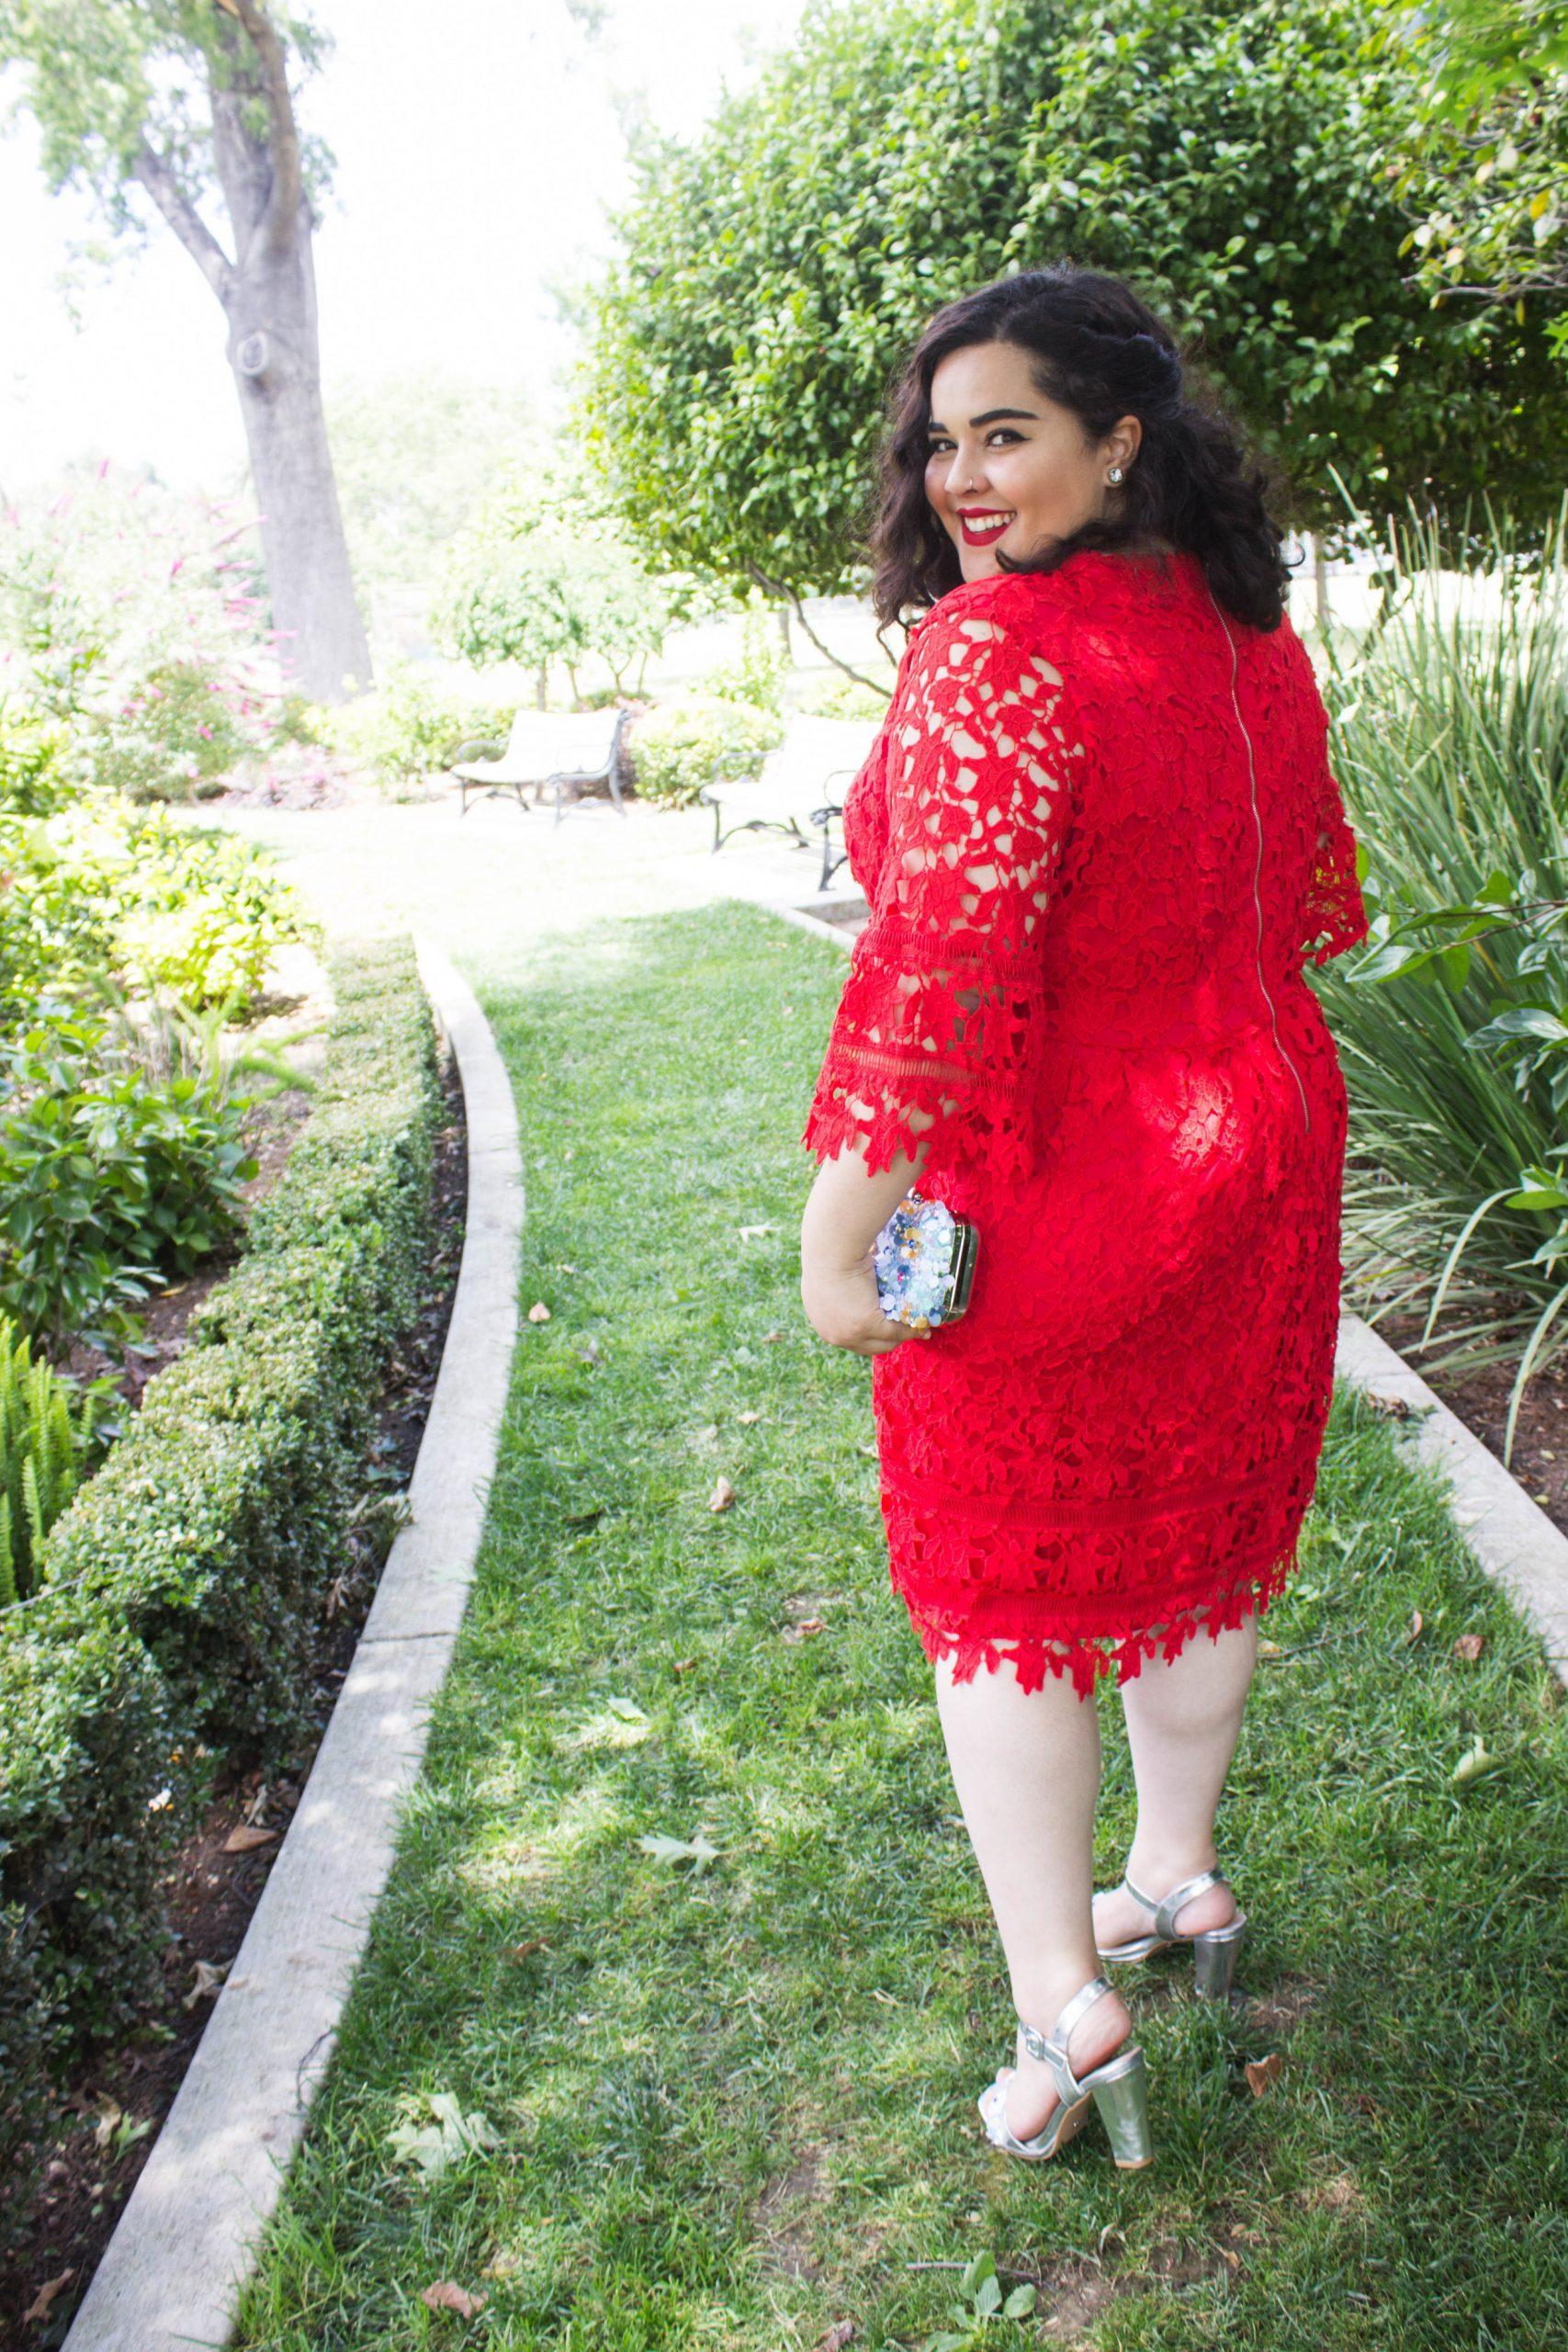 Plus Size Fashion Blogger- Mona of The Smiling Sweetheart